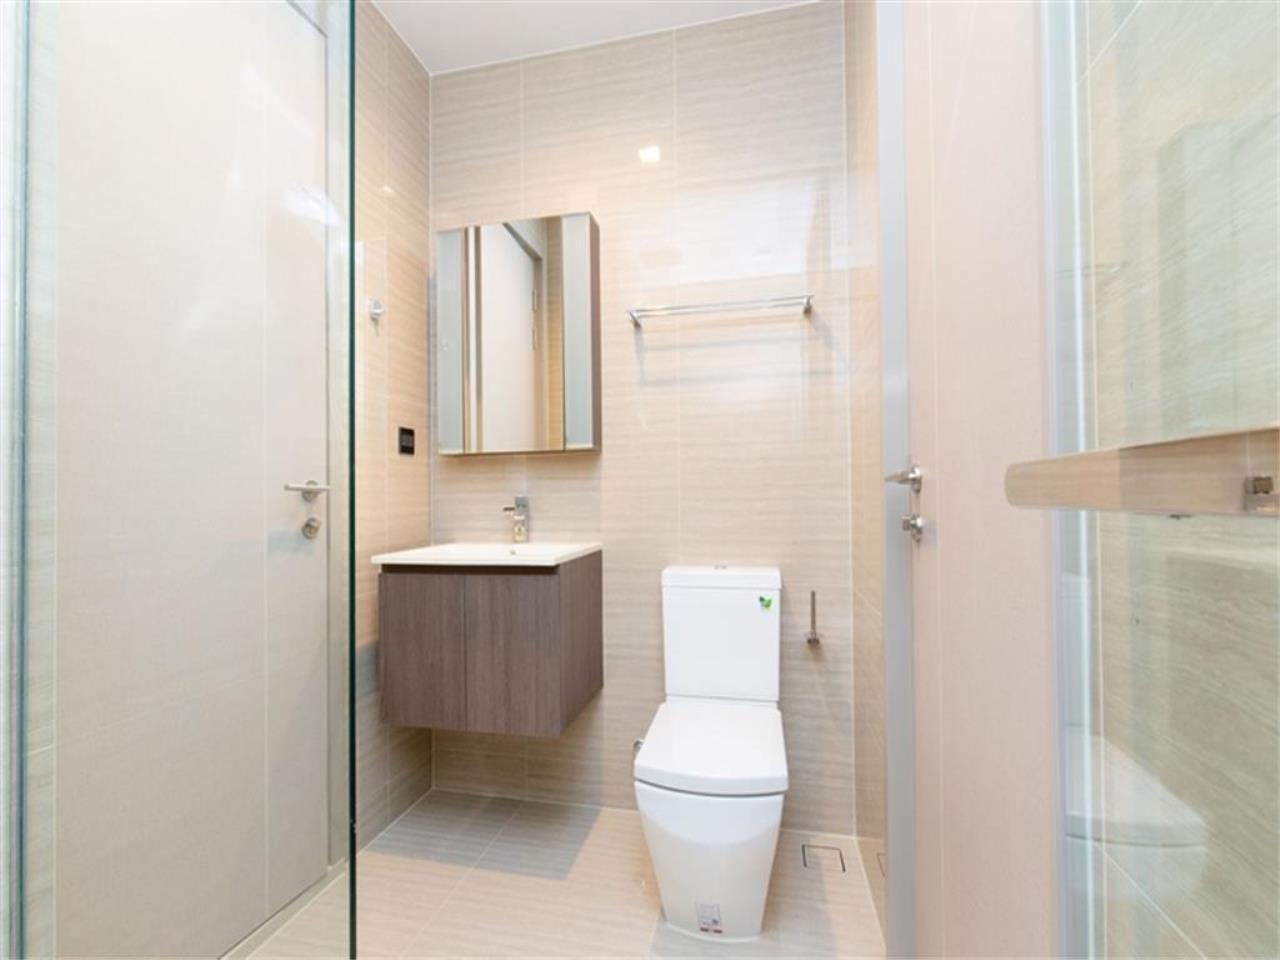 Plus Property Agency's Rent : CD188863 THE LINE ASOKE-RATCHADA Condominium New Petchburi - Rama 9 Bangkok 2